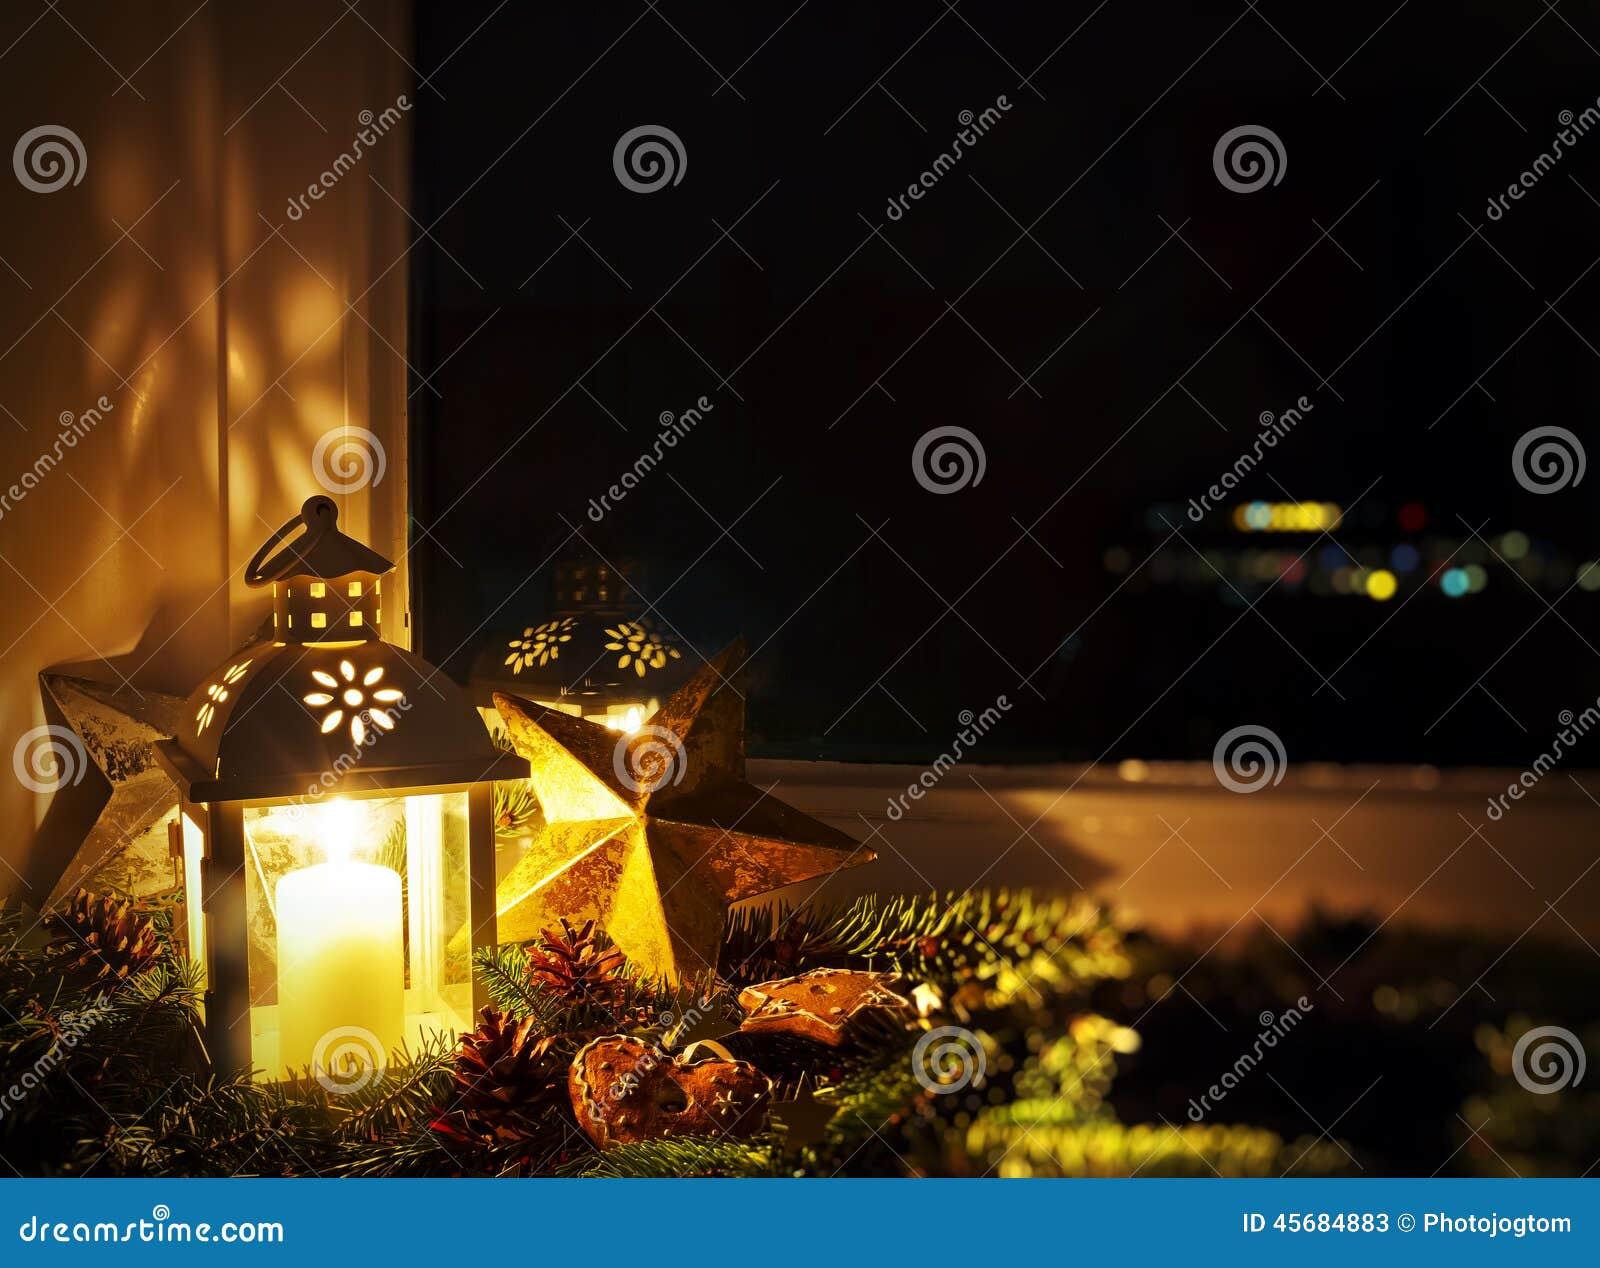 Christmas decoration on a window sill stock photo image - Christmas window sill lights ...